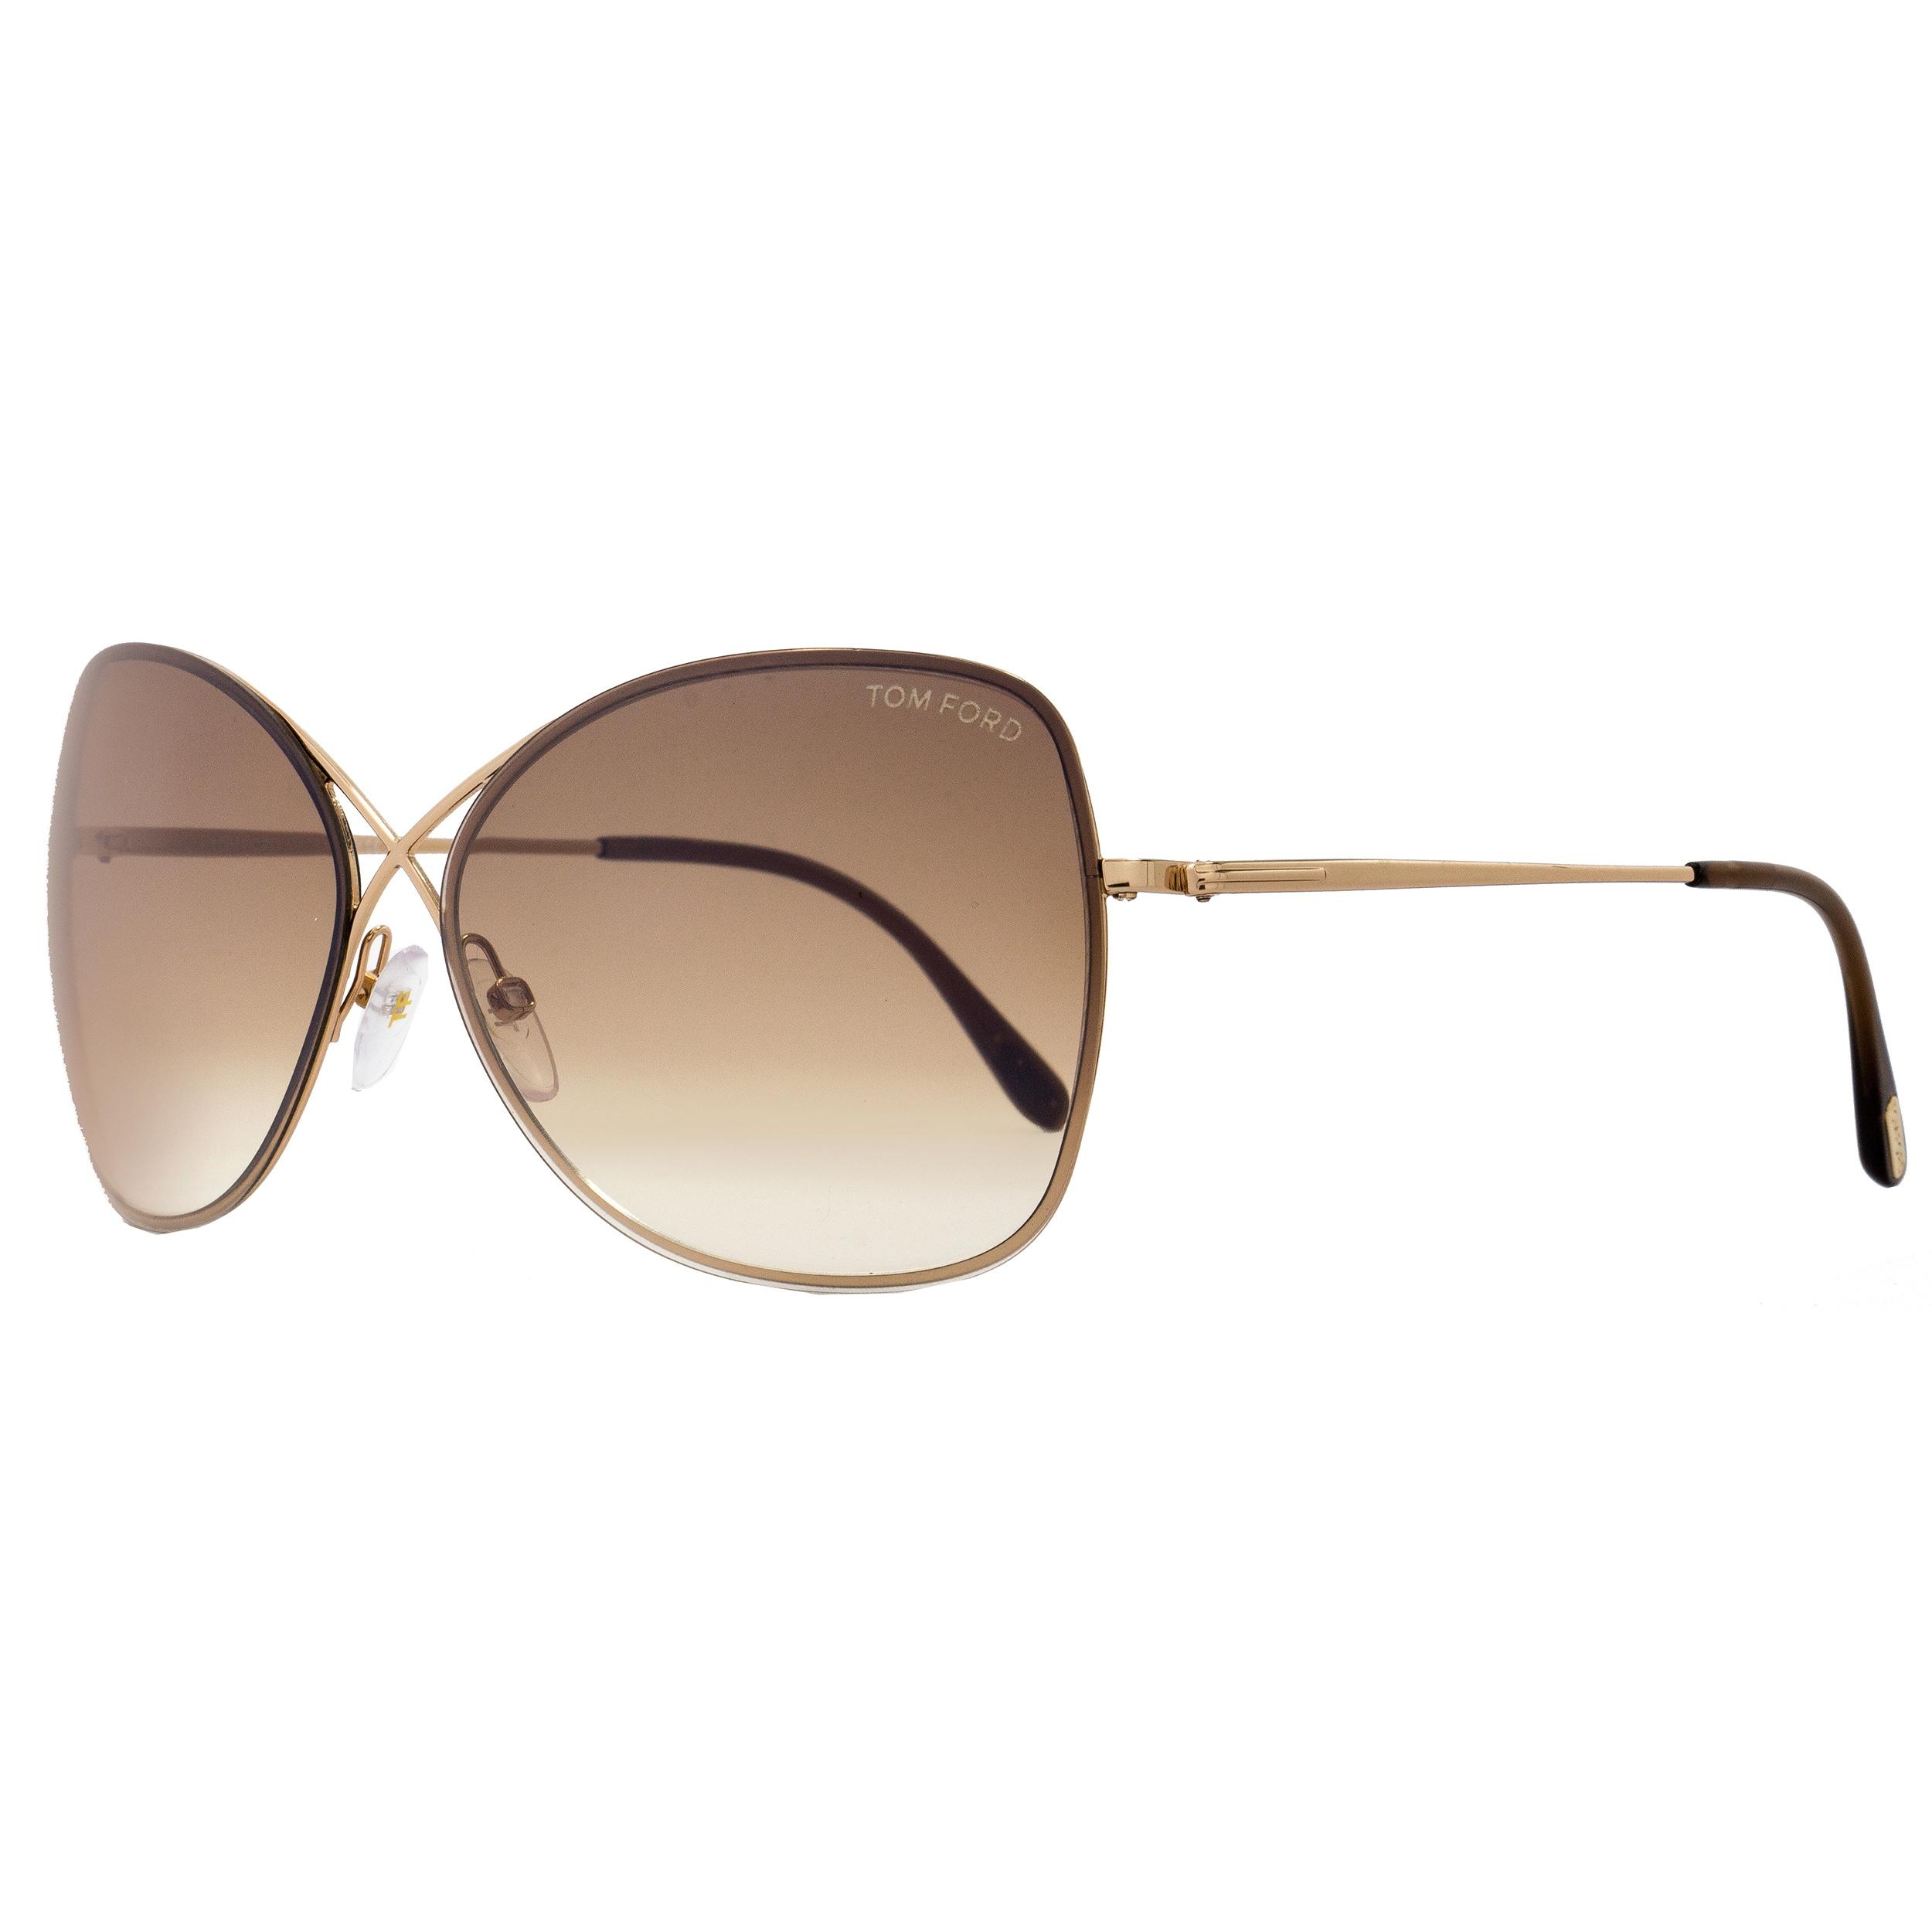 Tom Ford Tf250 Colette 28f Women S Rose Gold Brown Gradient Lens Sunglasses